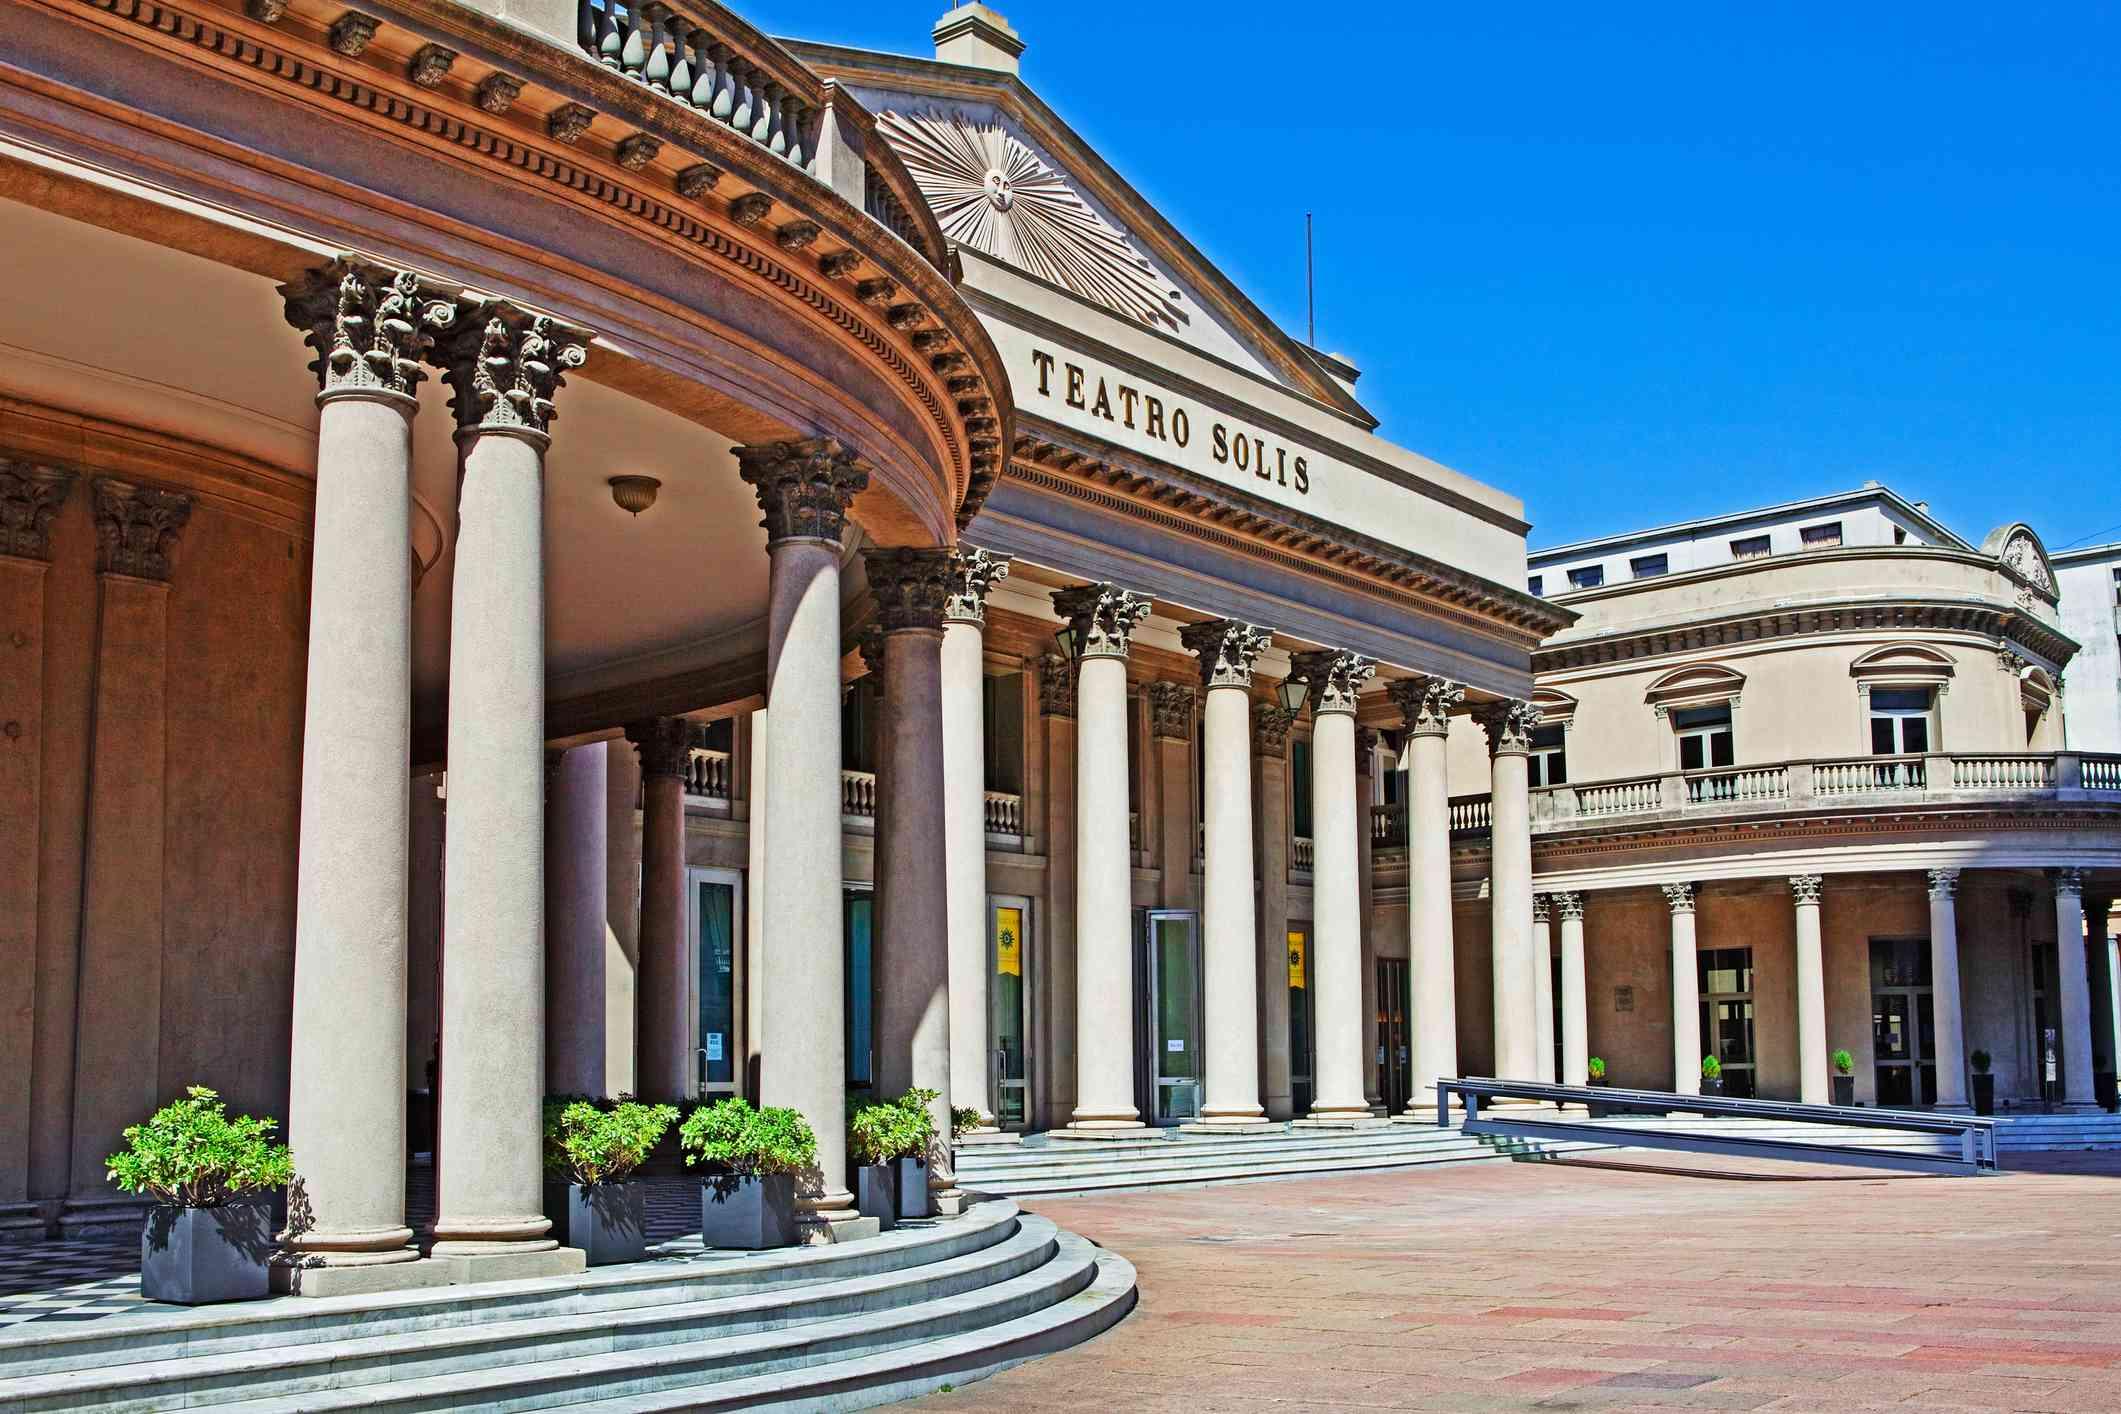 Teatro Solís, Montevideo, Uruguay